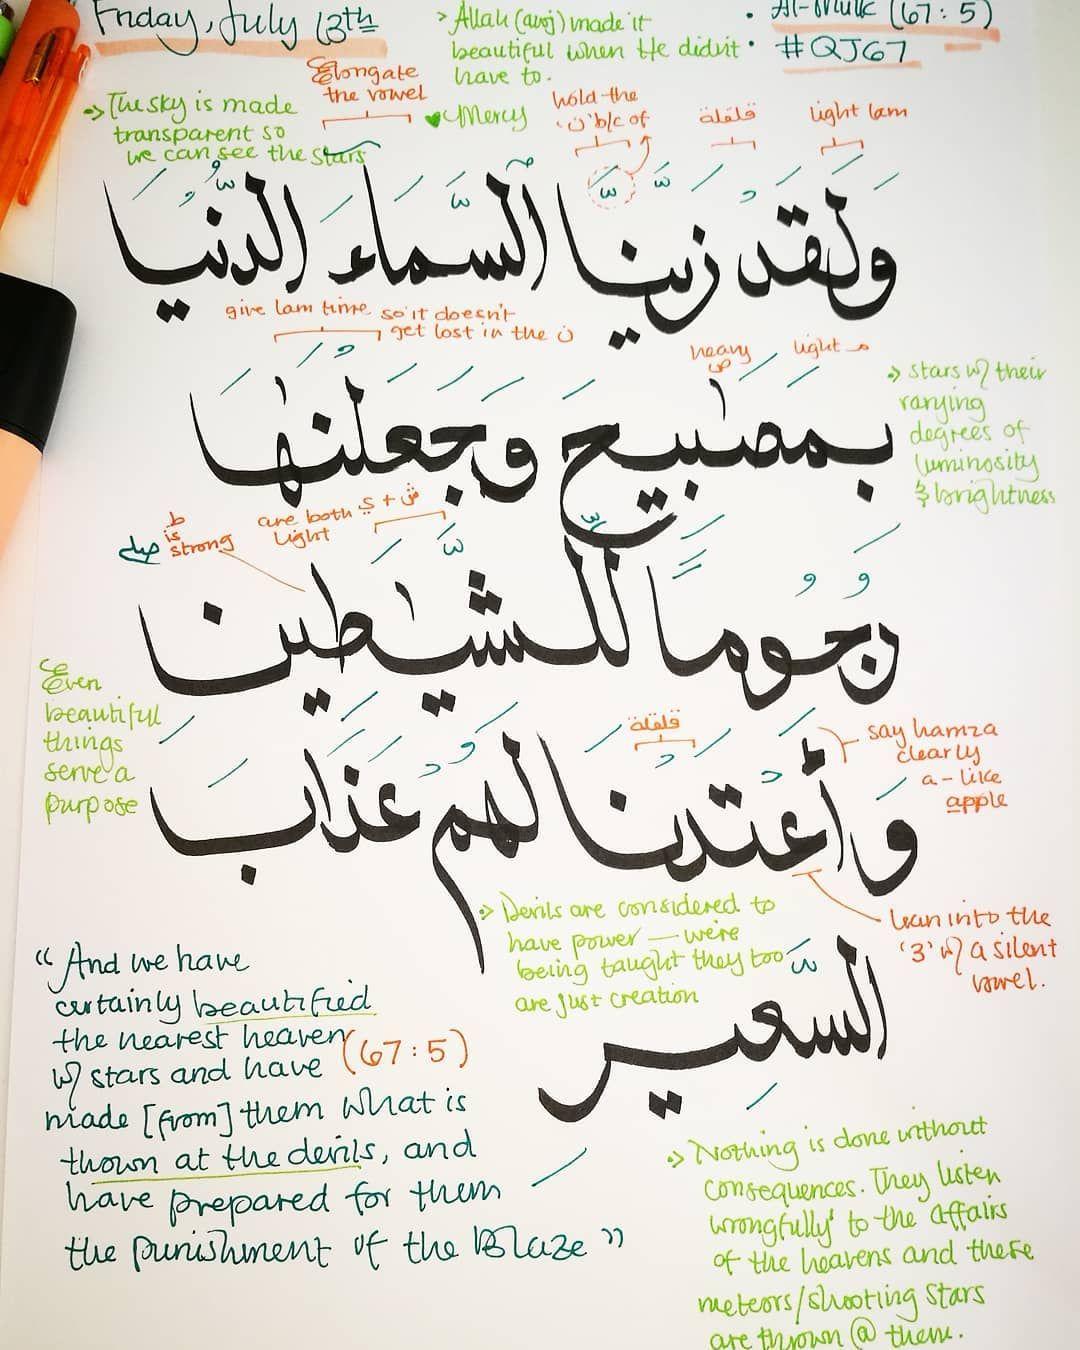 Qj67 Surat Al Mulk Ayah 5 And We Have Certainly